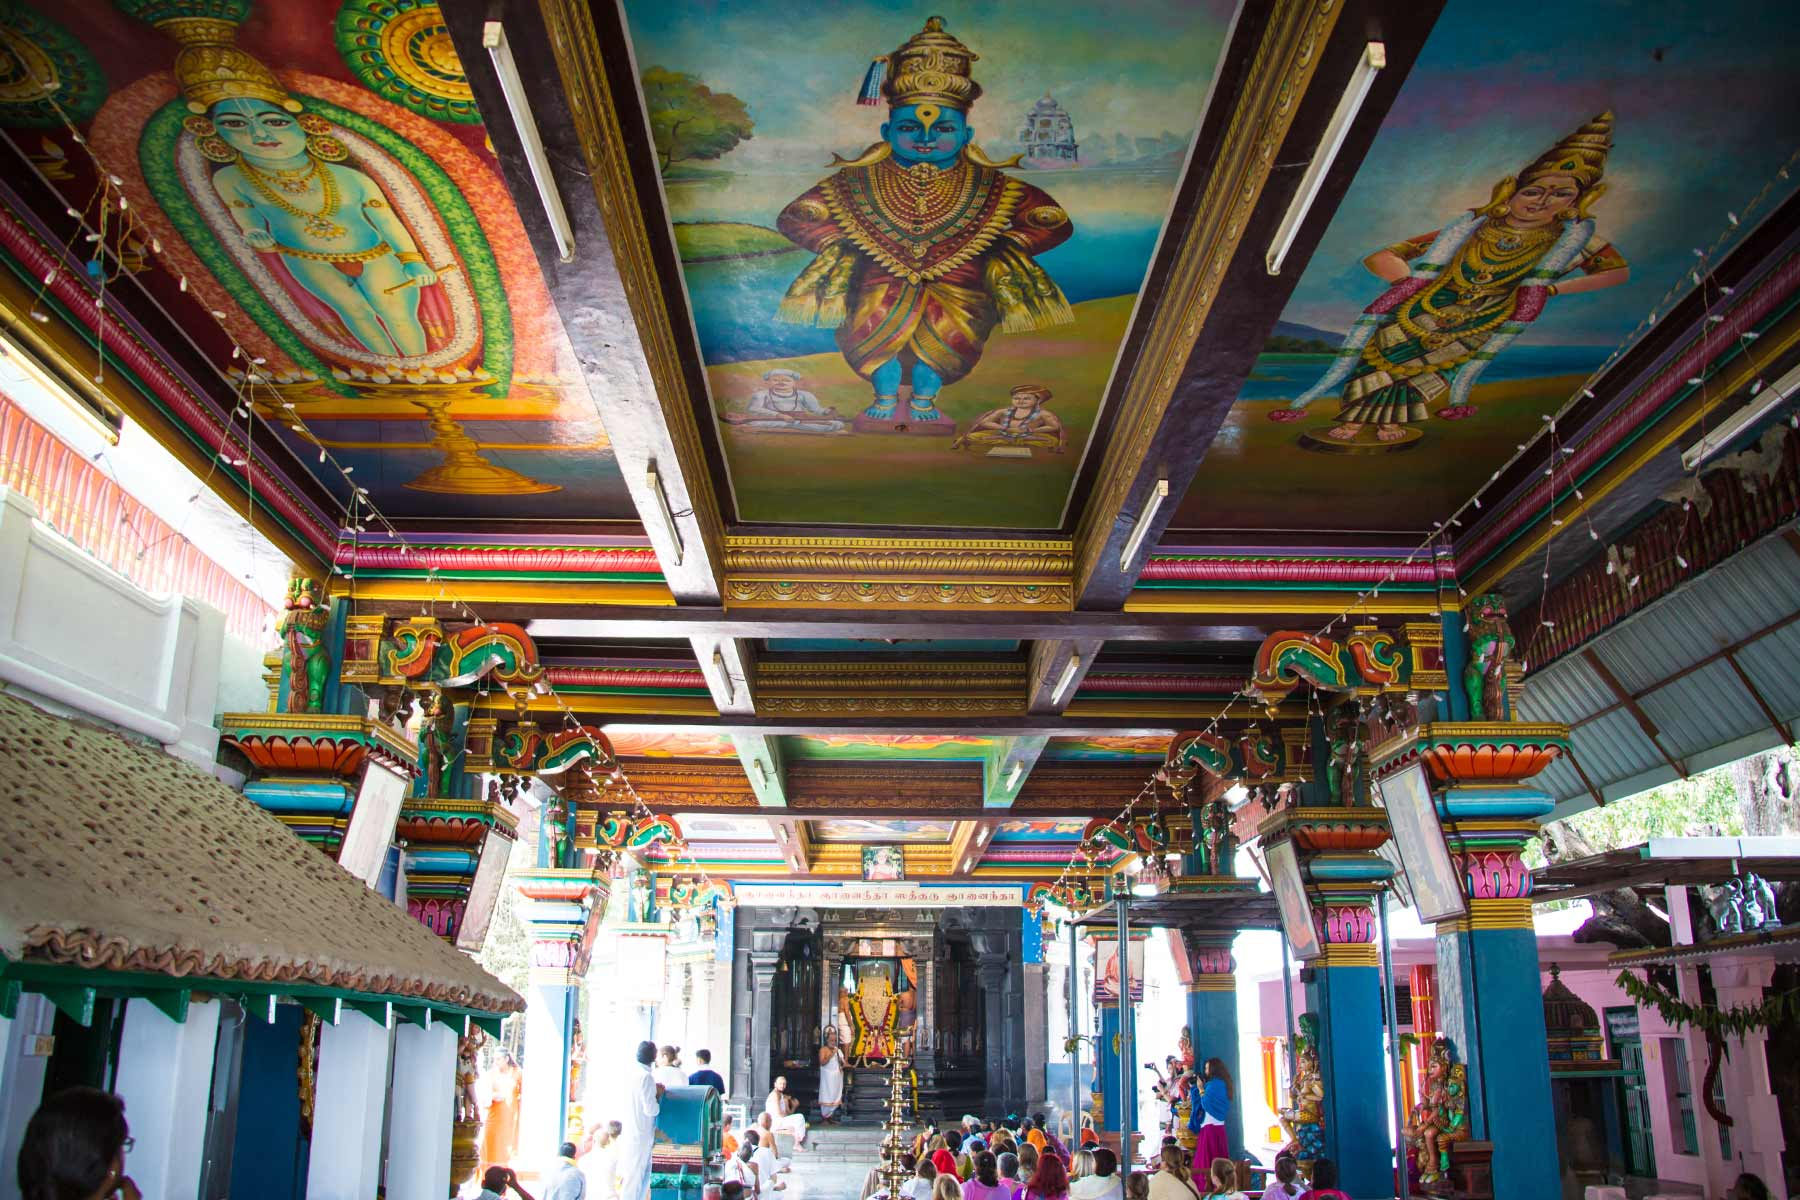 lord-panduranga-temple-ceiling